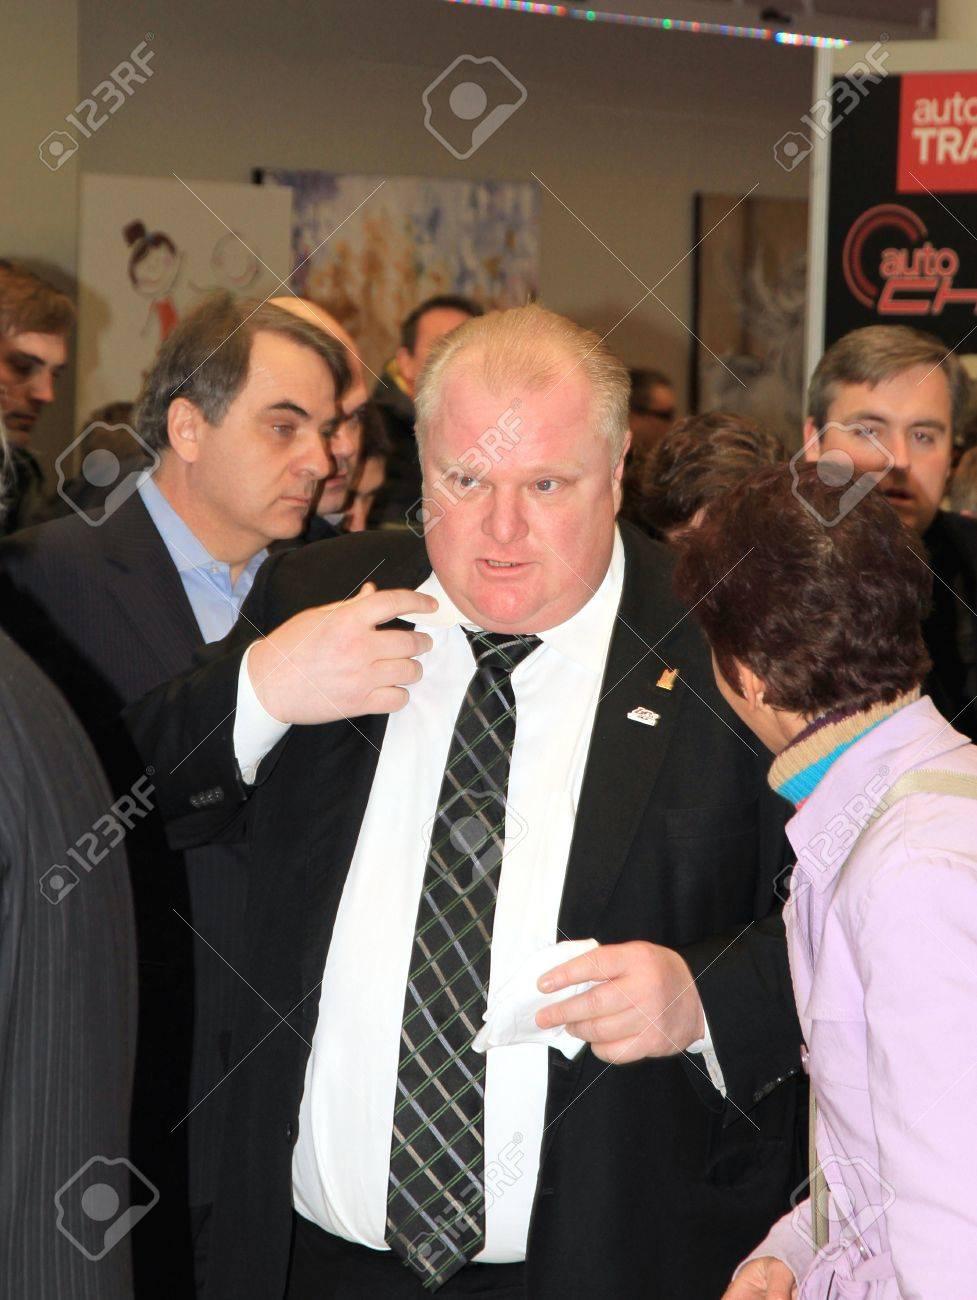 Toronto, March 15, 2013 - Toronto Mayor Rob Ford - 18368097